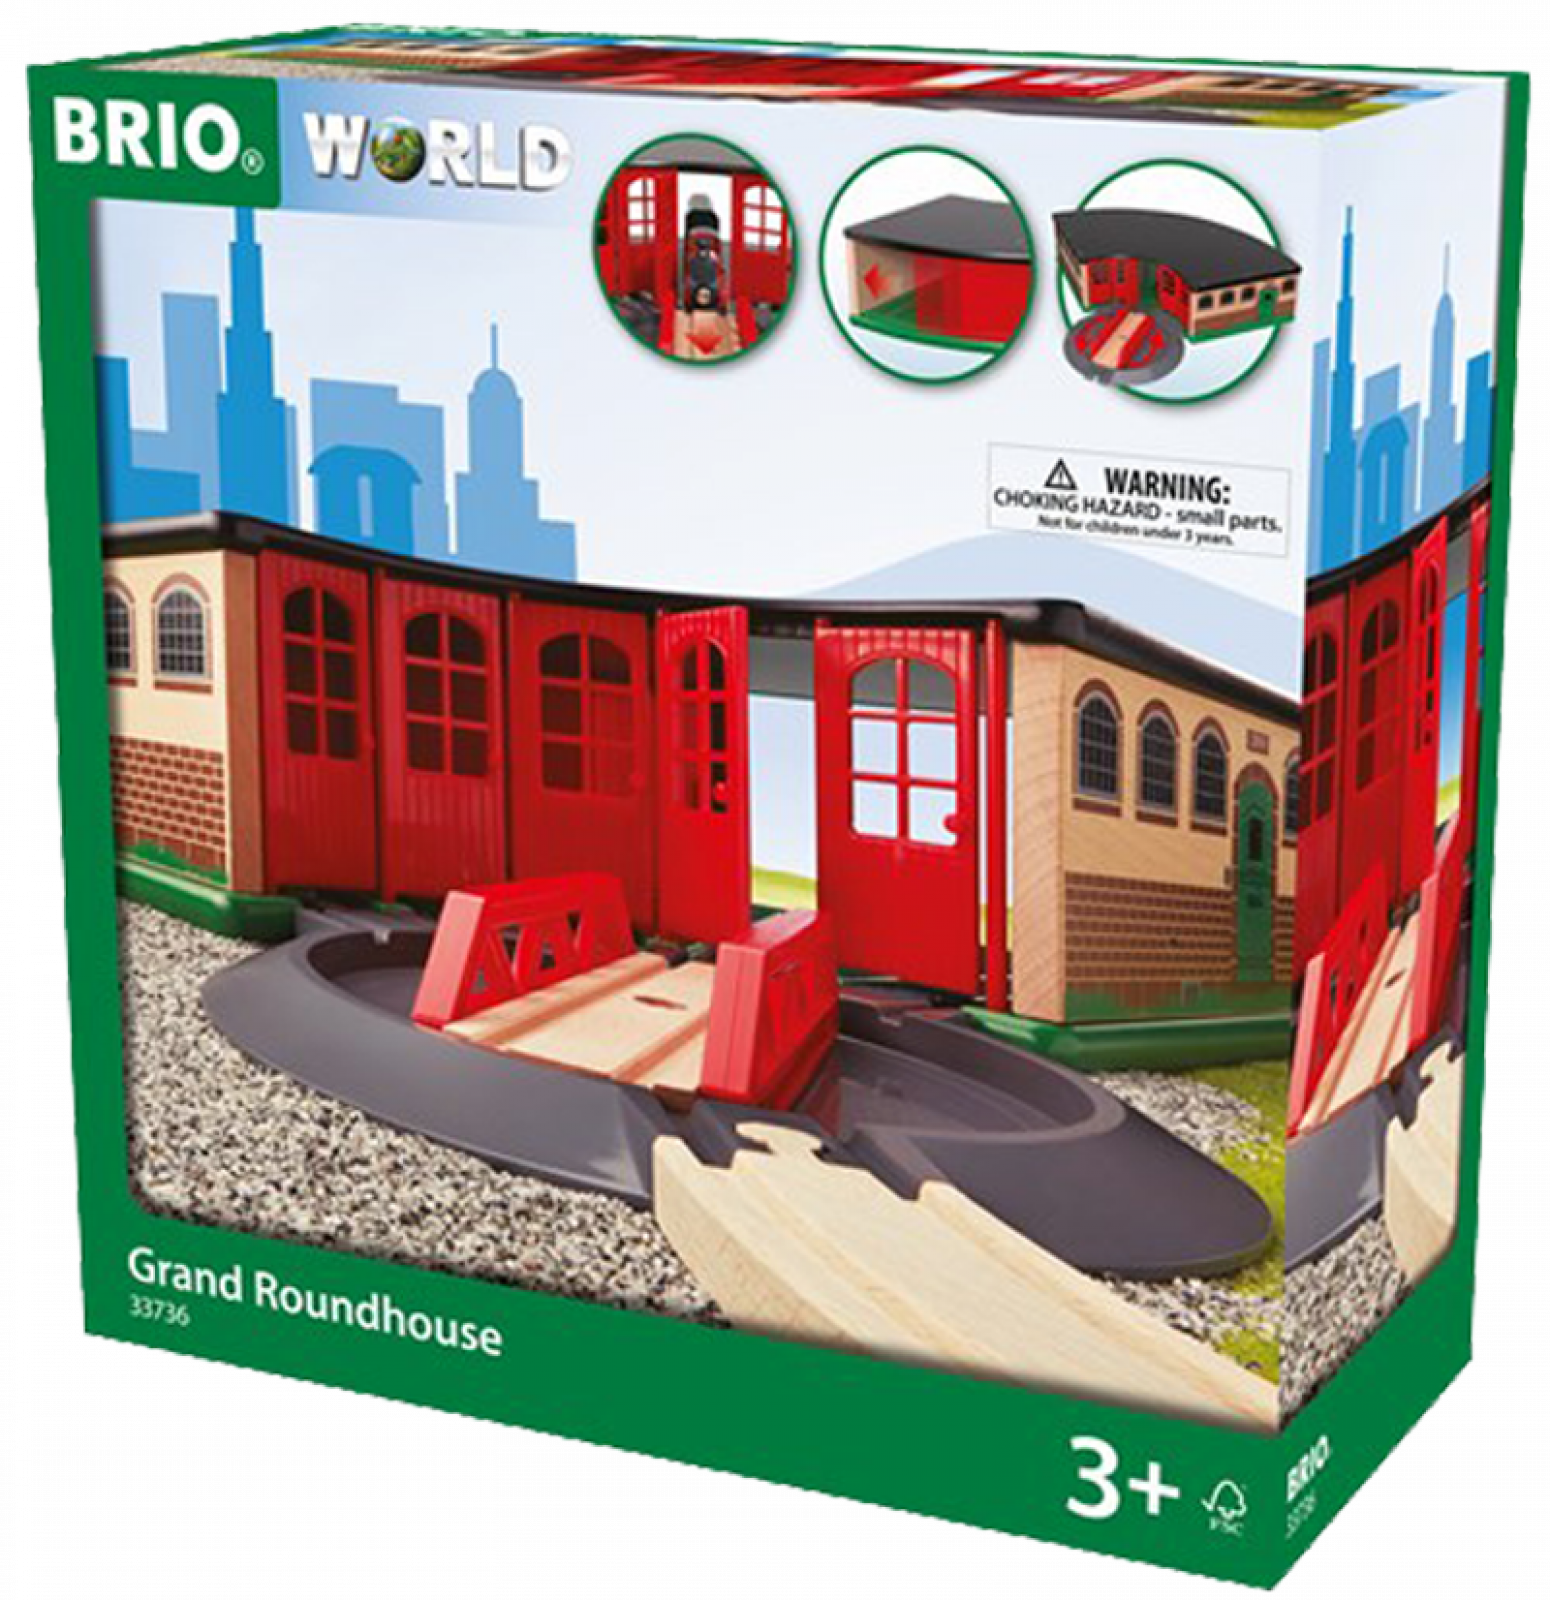 Grand Roundhouse BRIO® Wooden Railway Age 3+